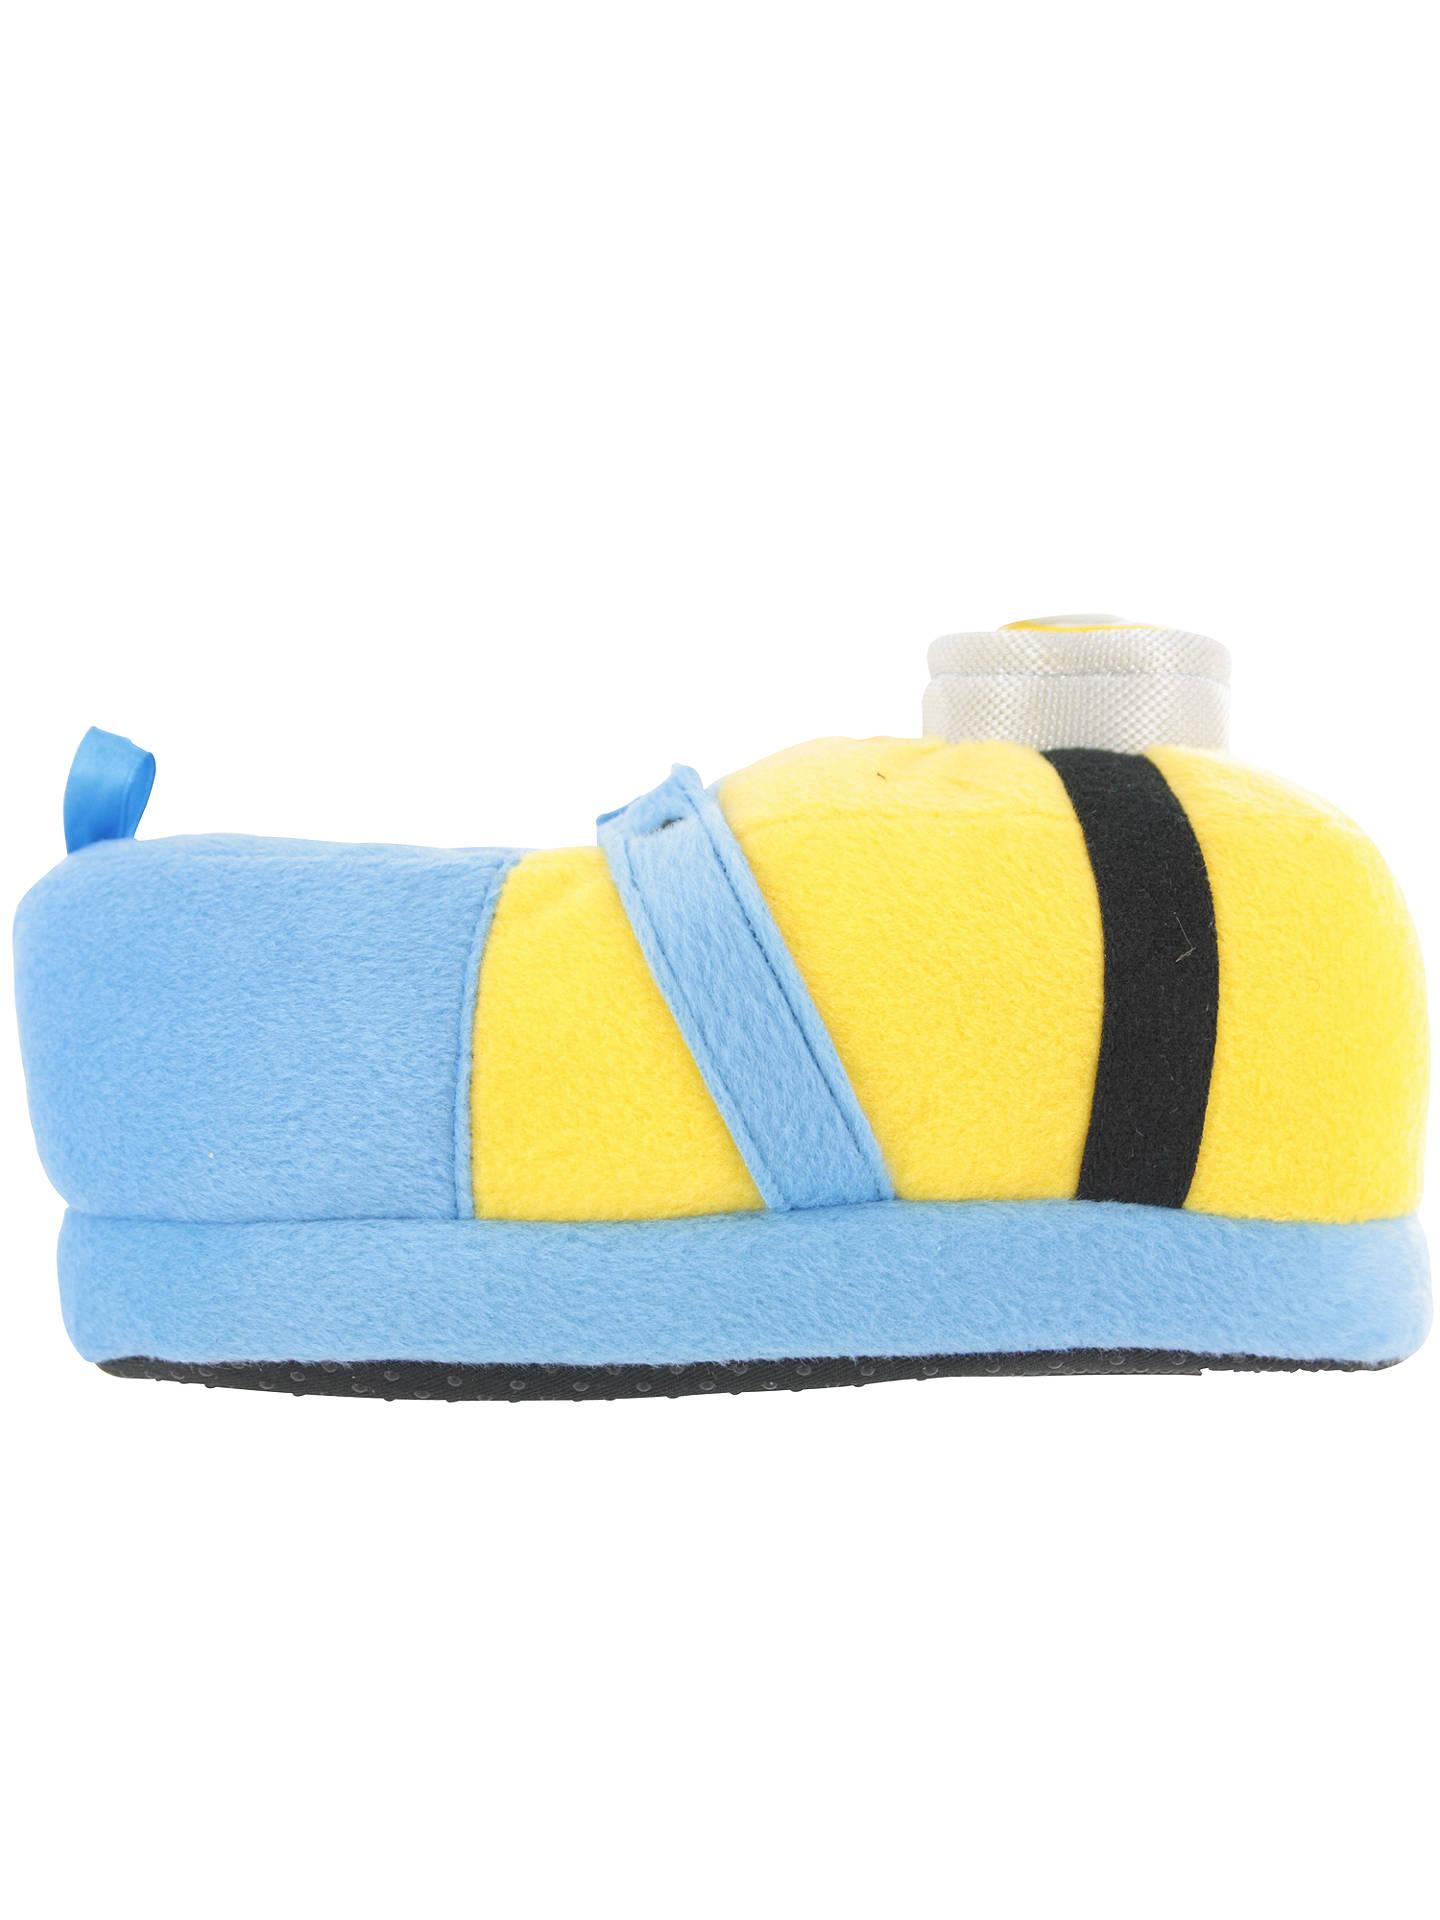 b9ba55ae9fe Buy Minions Children s 3D Slippers